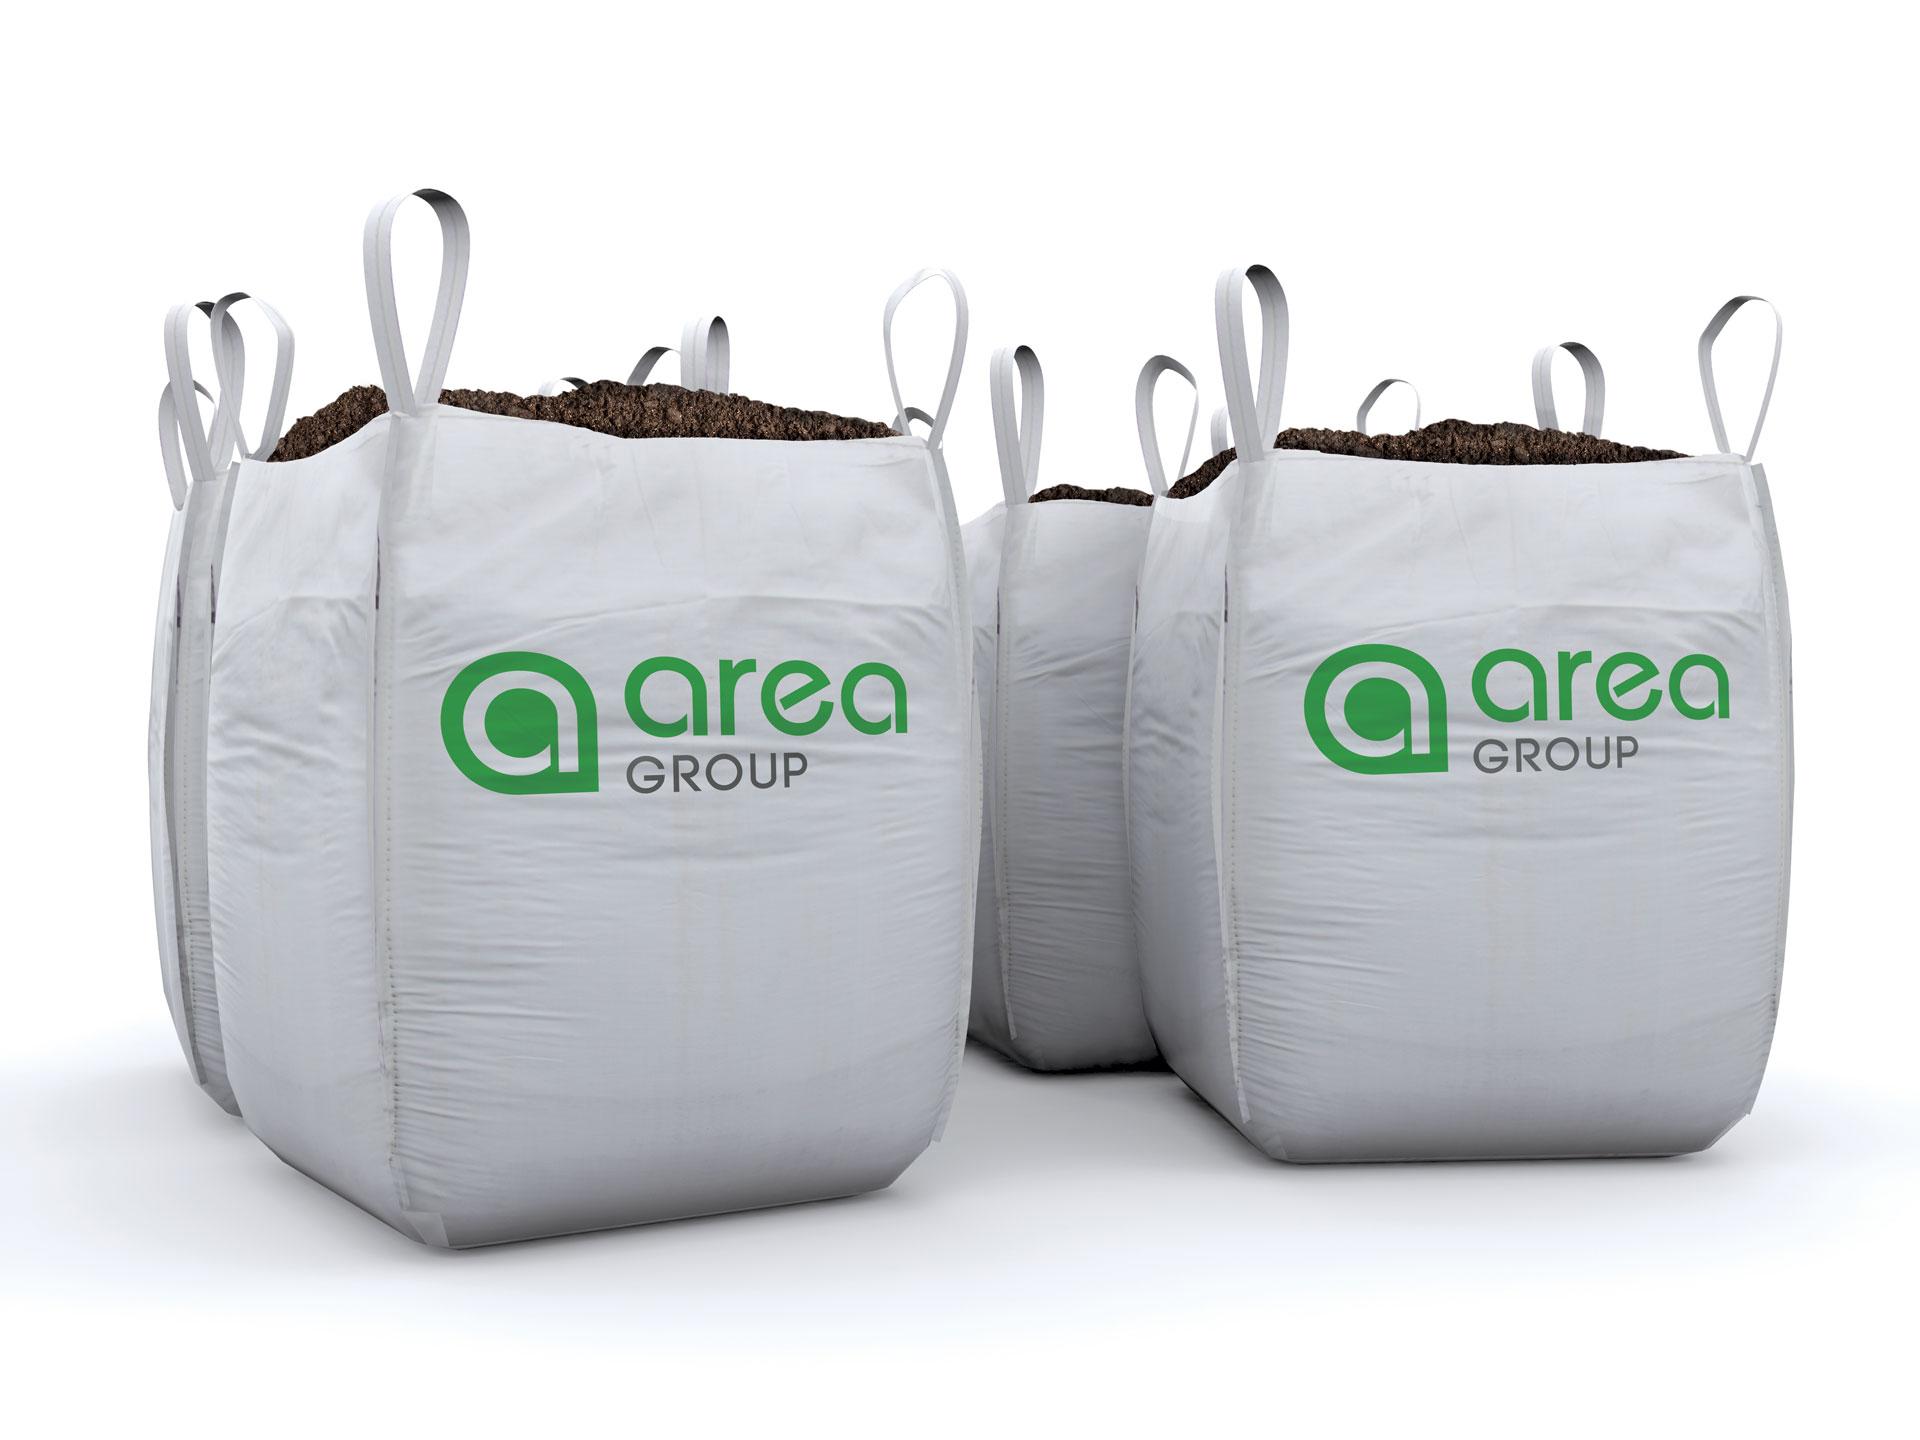 Big Bag Terre Vegetale Jardiland : terre, vegetale, jardiland, AreaGroup, Terre, Végétale